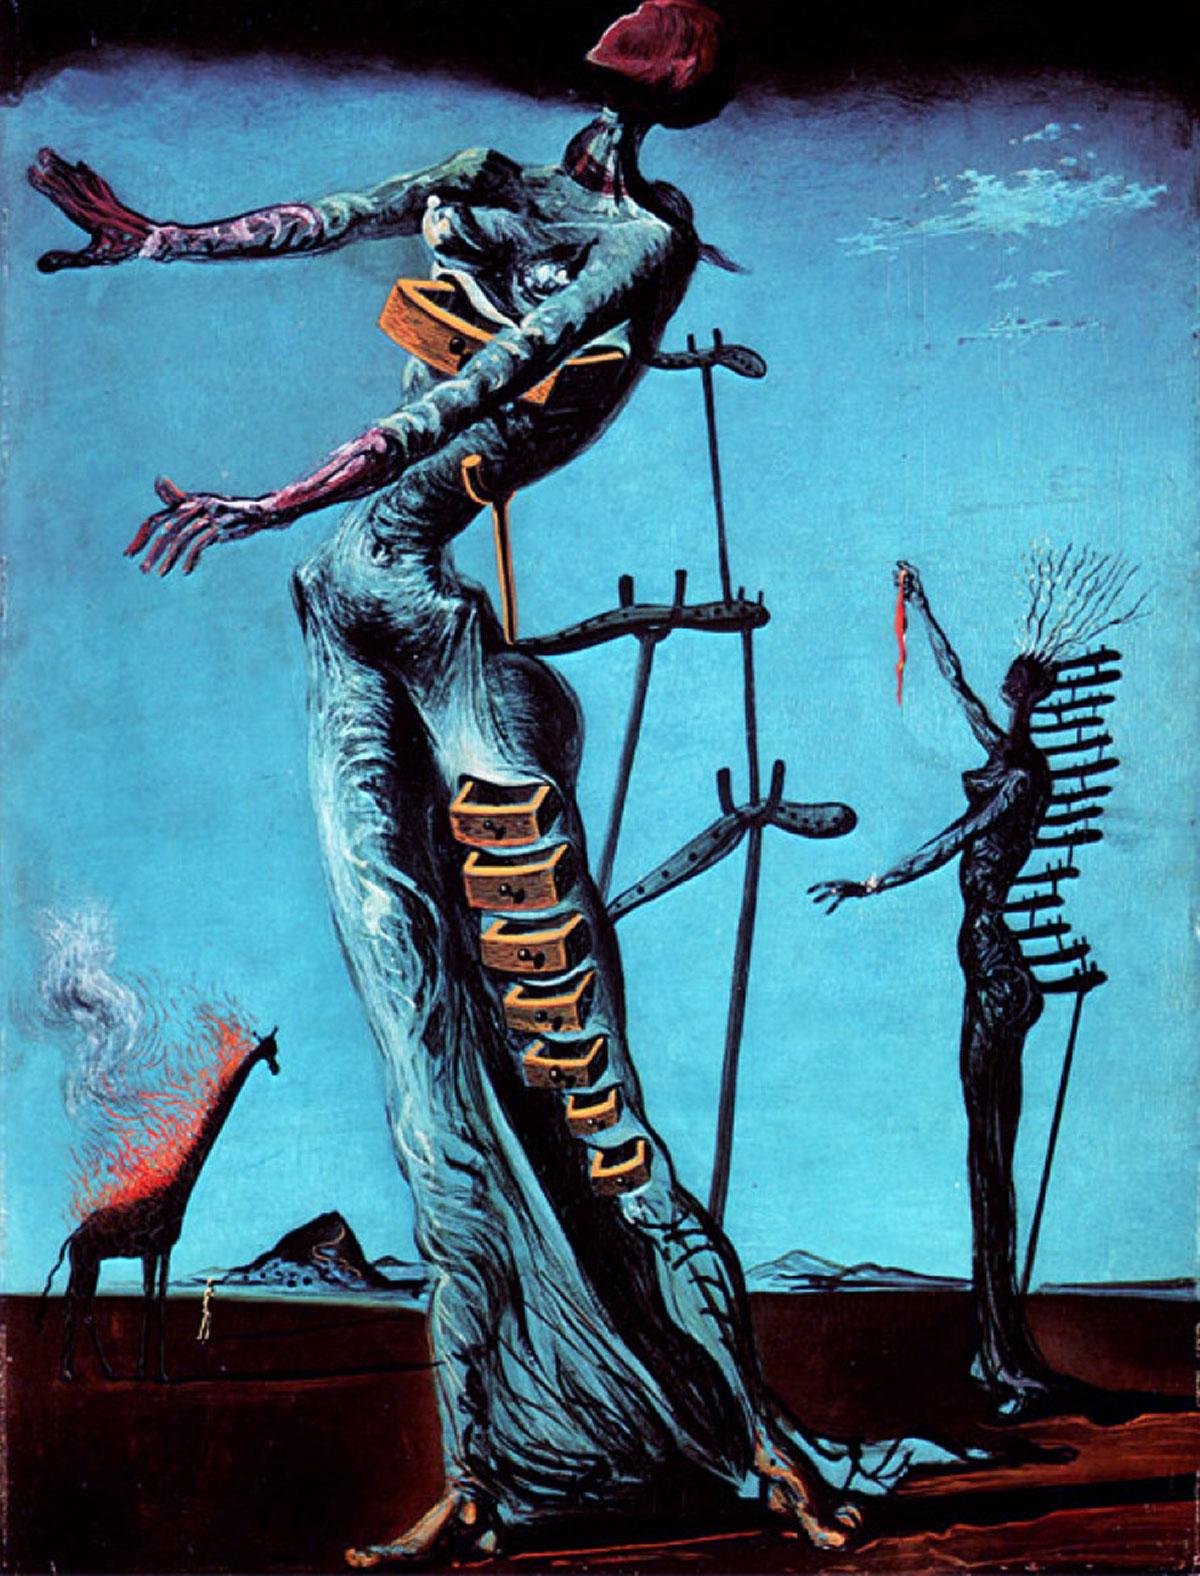 The burning giraffe /La persistència de la memòria/ + Dalí, Salvador *magnifico